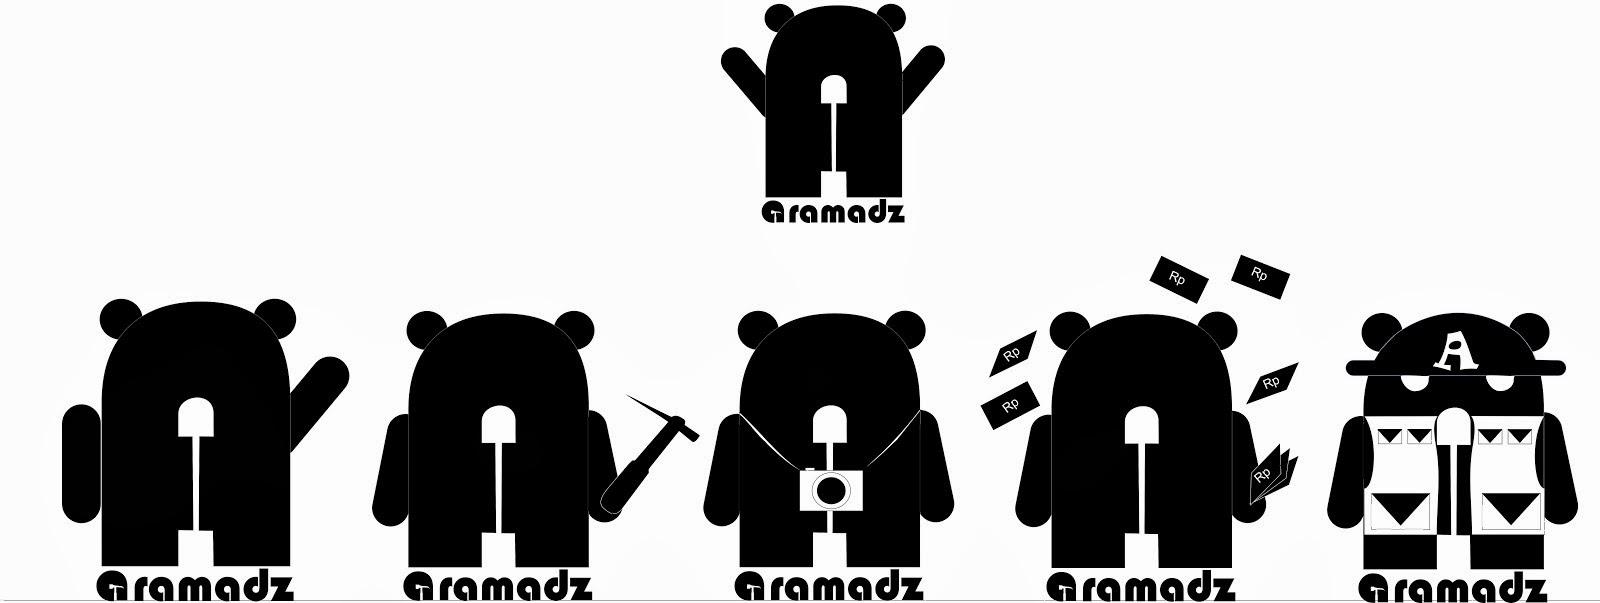 Aramdz's family